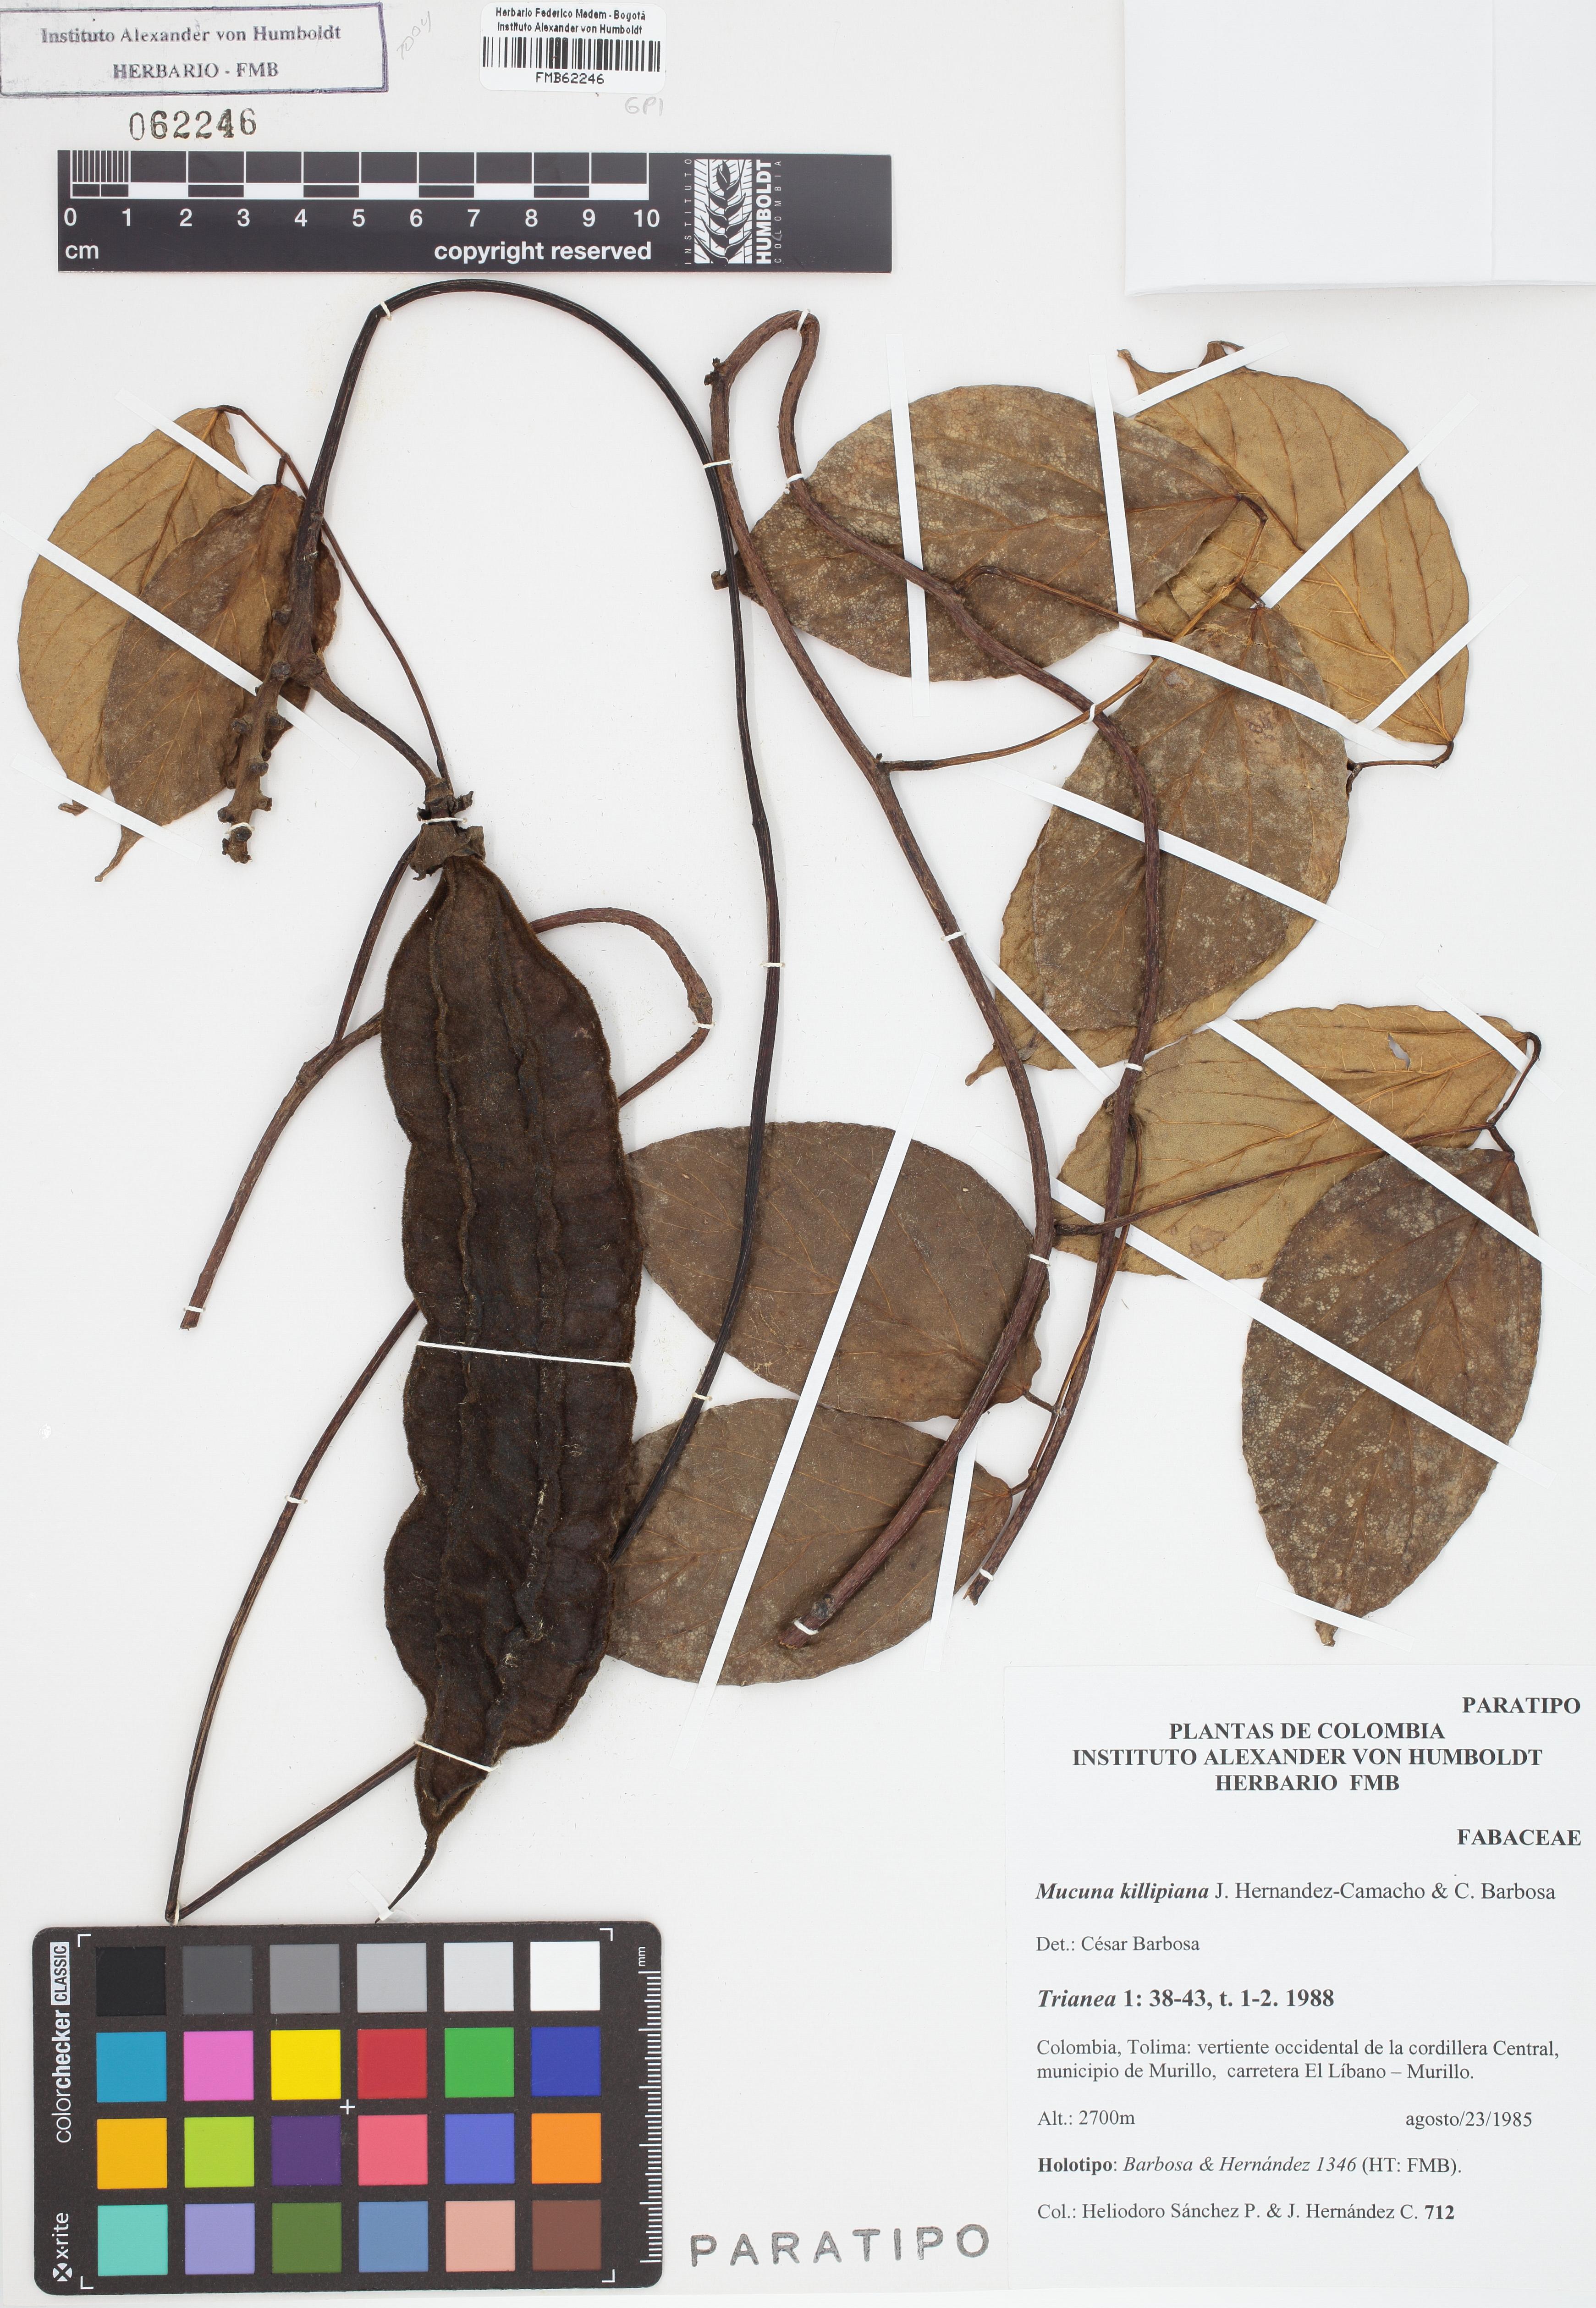 Paratipo de <em>Mucuna killipiana</em>, FMB-62246, Fotografía por Robles A.